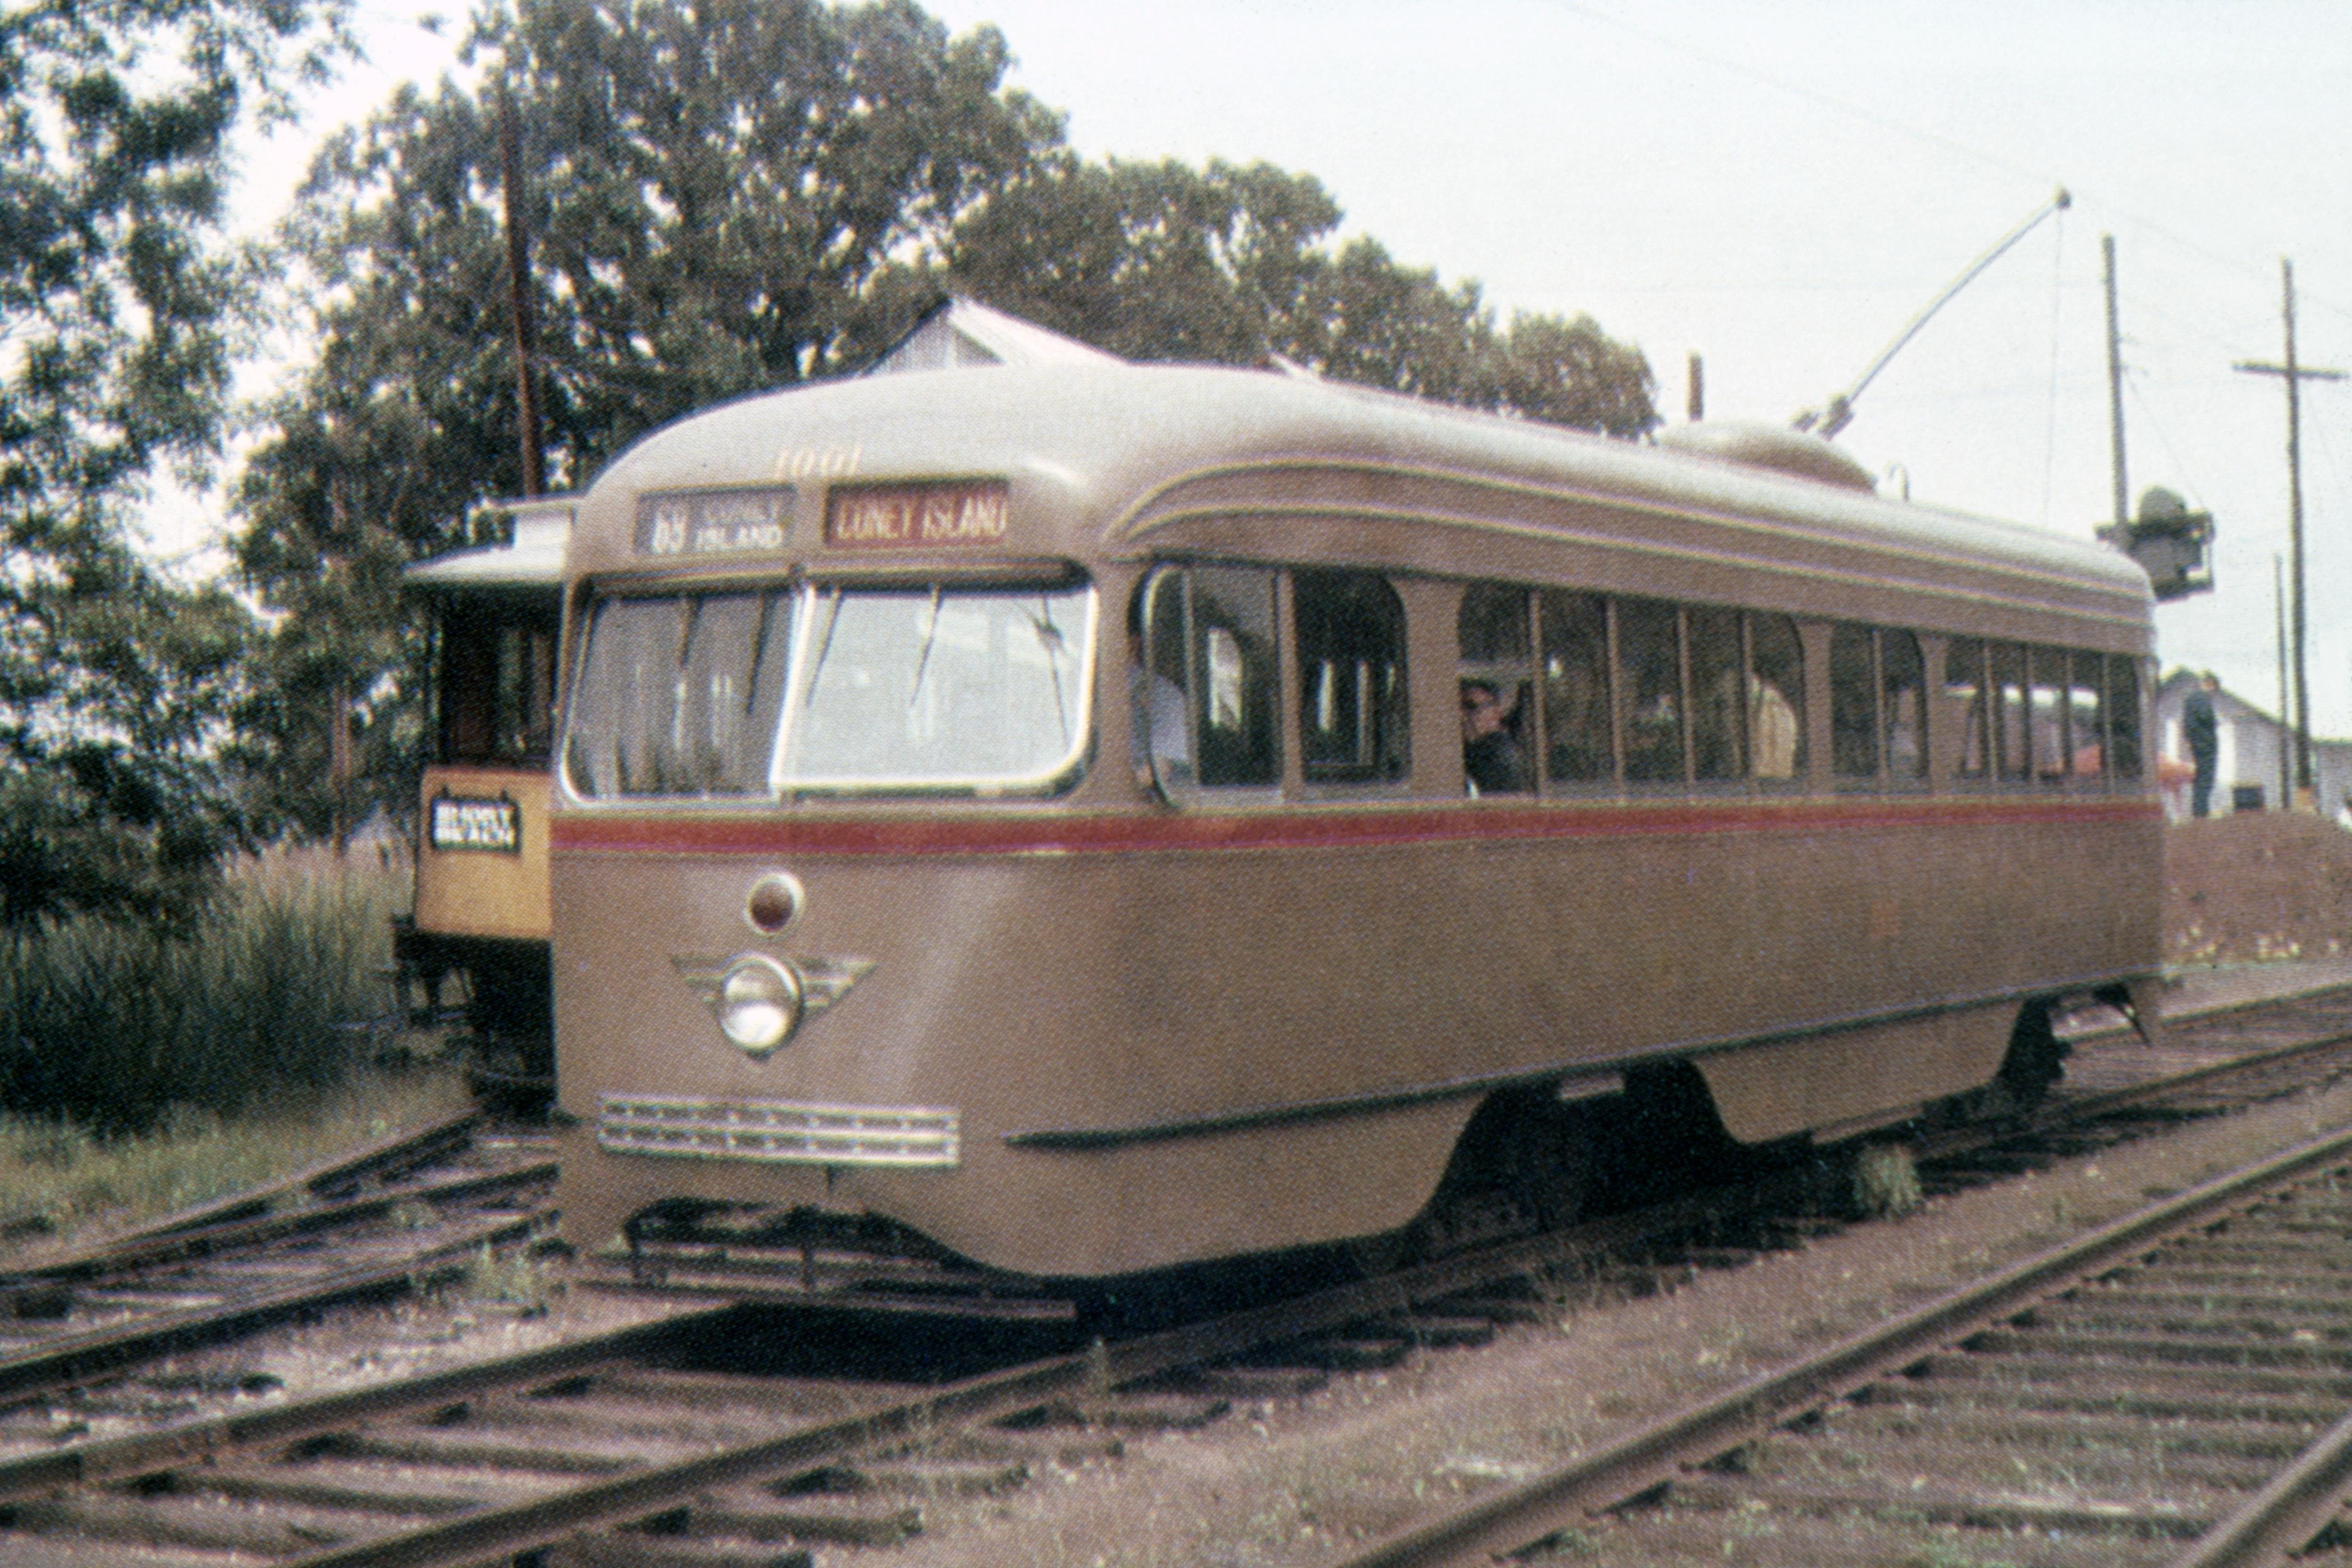 (5678k, 5000x3334)<br><b>Country:</b> United States<br><b>City:</b> East Haven/Branford, Ct.<br><b>System:</b> Shore Line Trolley Museum<br><b>Car:</b> B&QT/BMT 1001 <br><b>Photo by:</b> Ed Davis, Sr.<br><b>Collection of:</b> David Pirmann<br><b>Viewed (this week/total):</b> 0 / 50